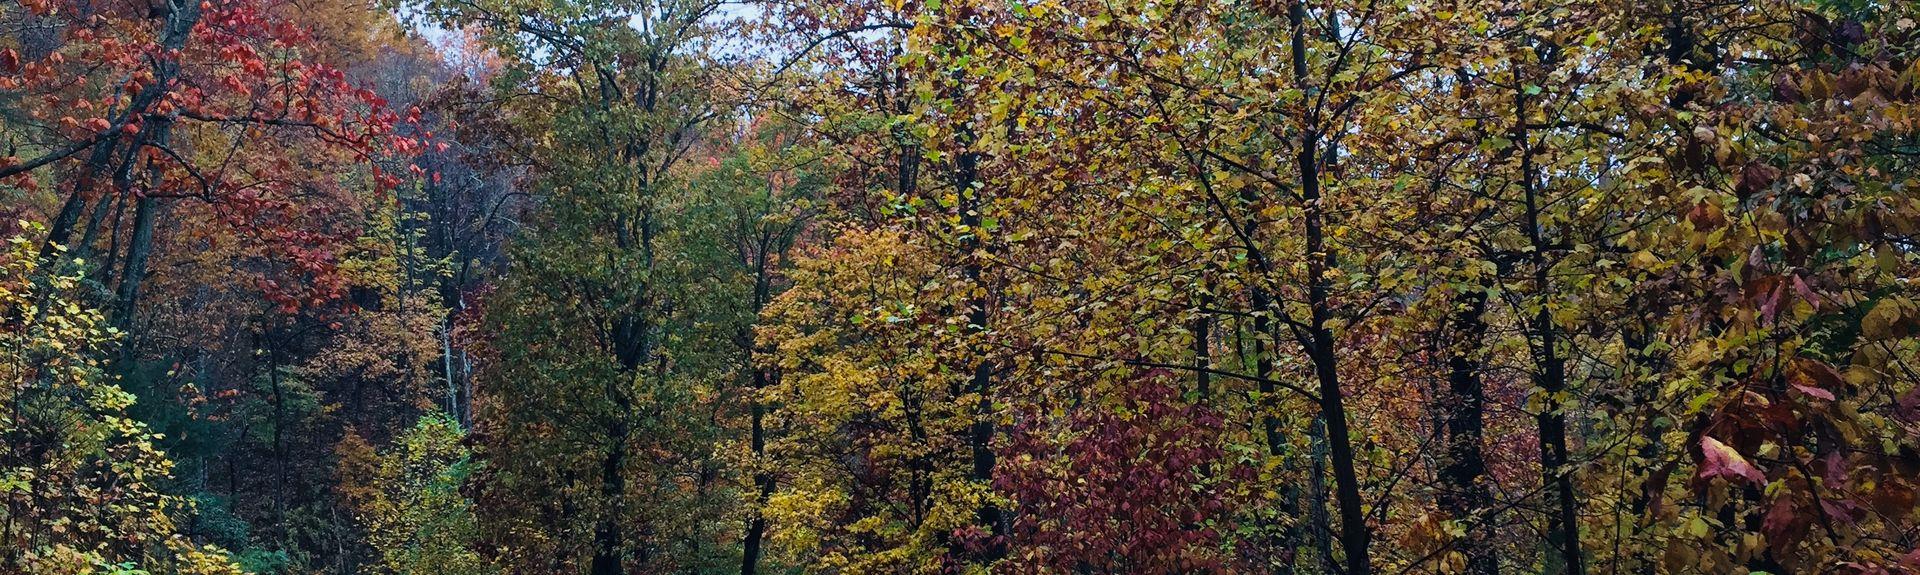 Moravian Falls, North Carolina, USA